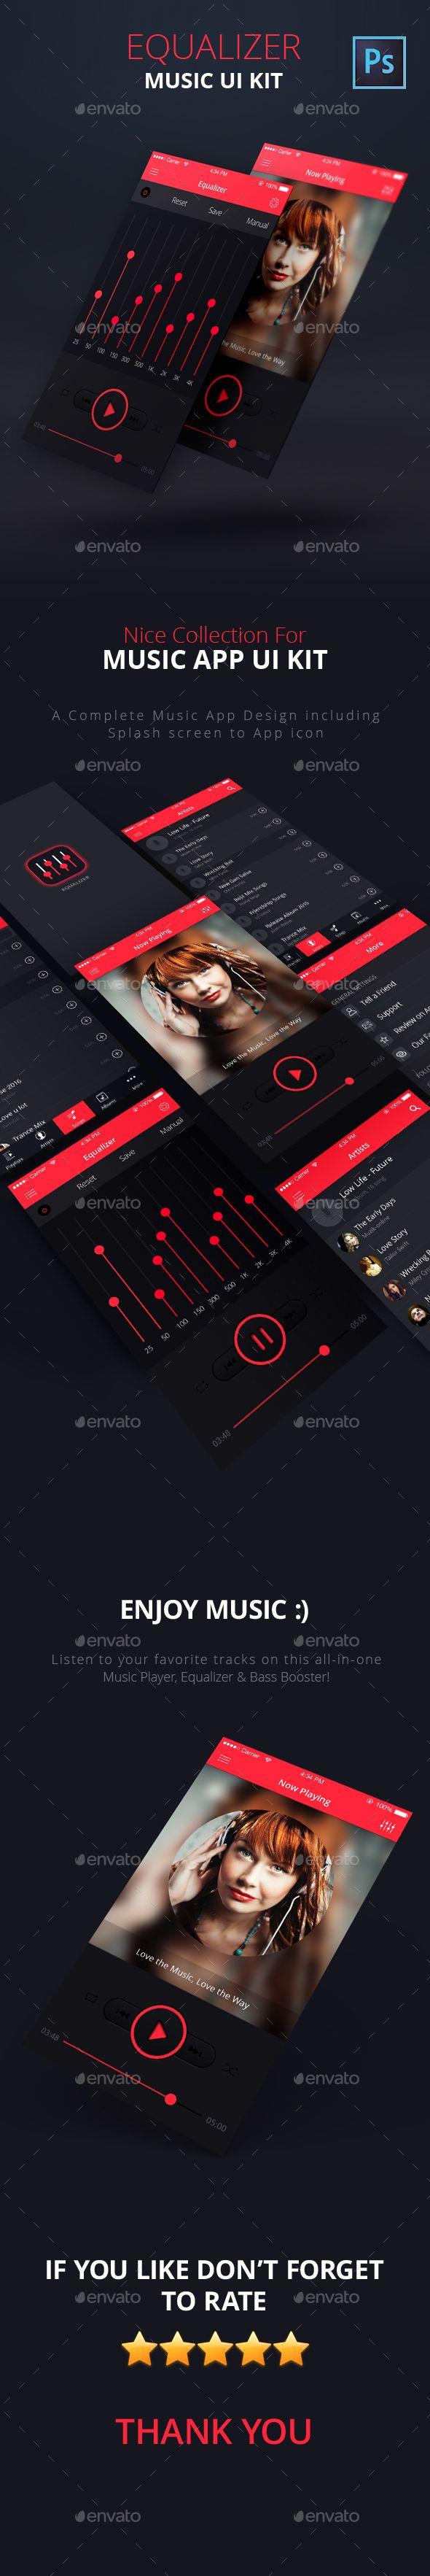 Equalizer – Music App UI Kit Template PSD. Download here: http://graphicriver.net/item/equalizer-music-app-ui-kit-psd/15614268?ref=ksioks